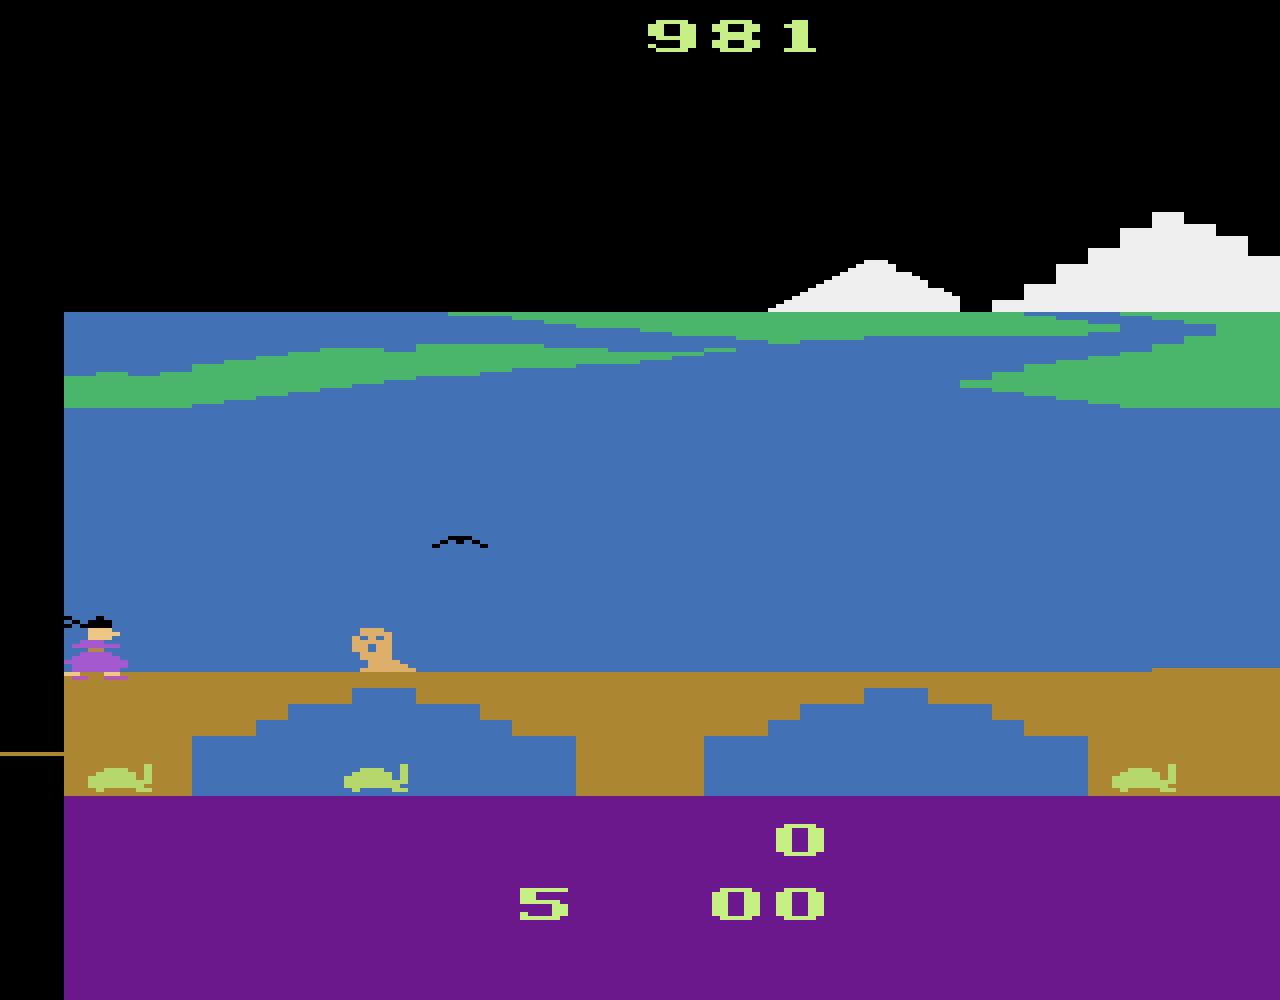 Lilly Adventure (1983) (Home Vision - Gem International Corp